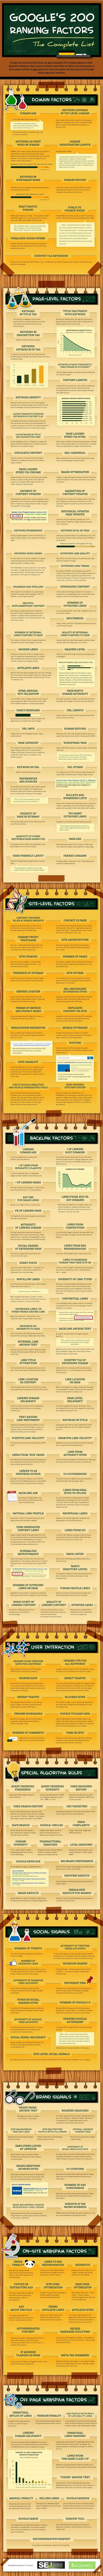 Critères algo Google SEO - Attention : 2013 !